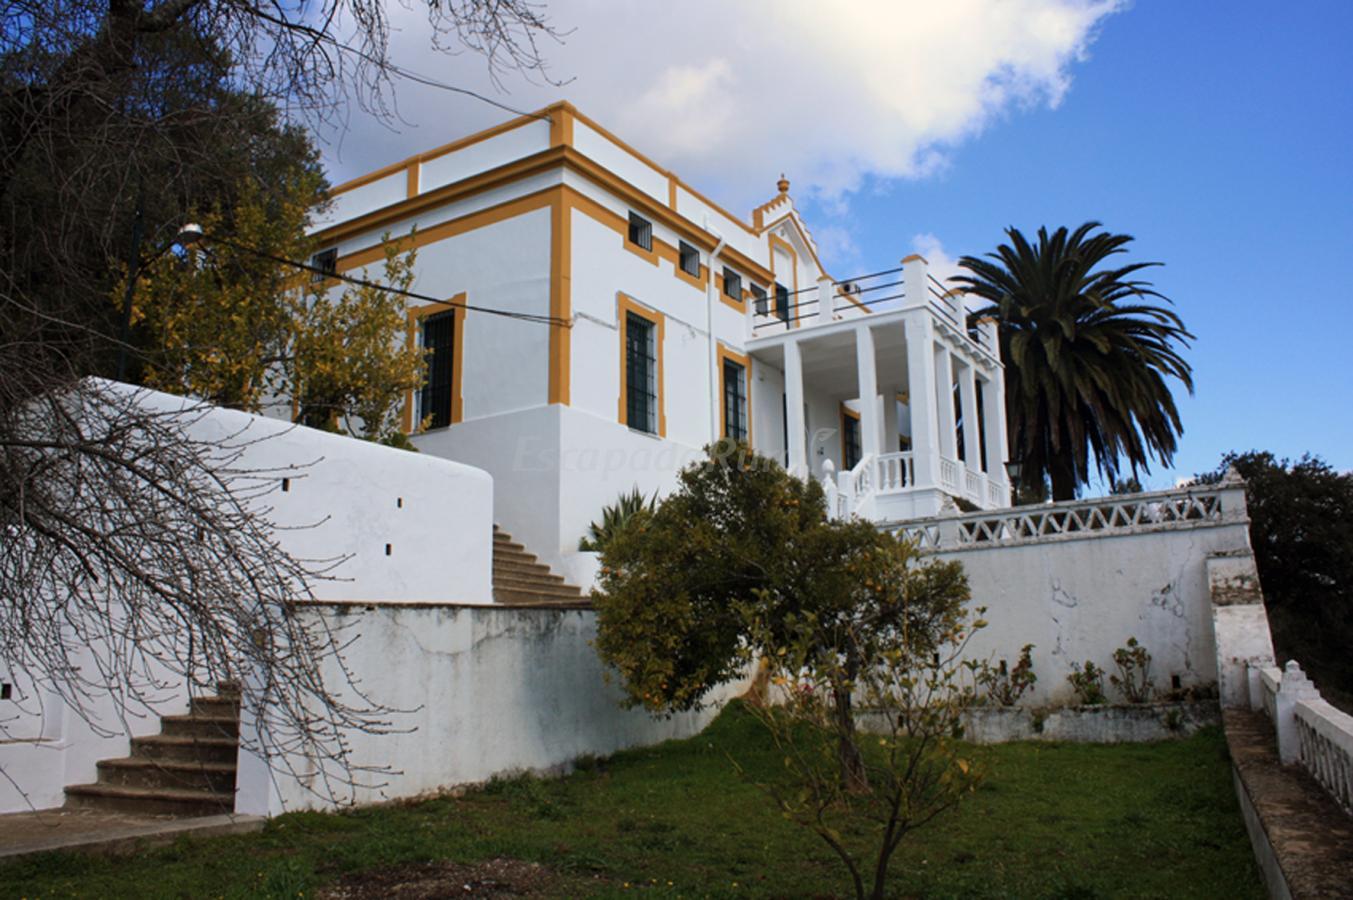 Fotos De El Retiro Casa Rural En Al Jar Huelva